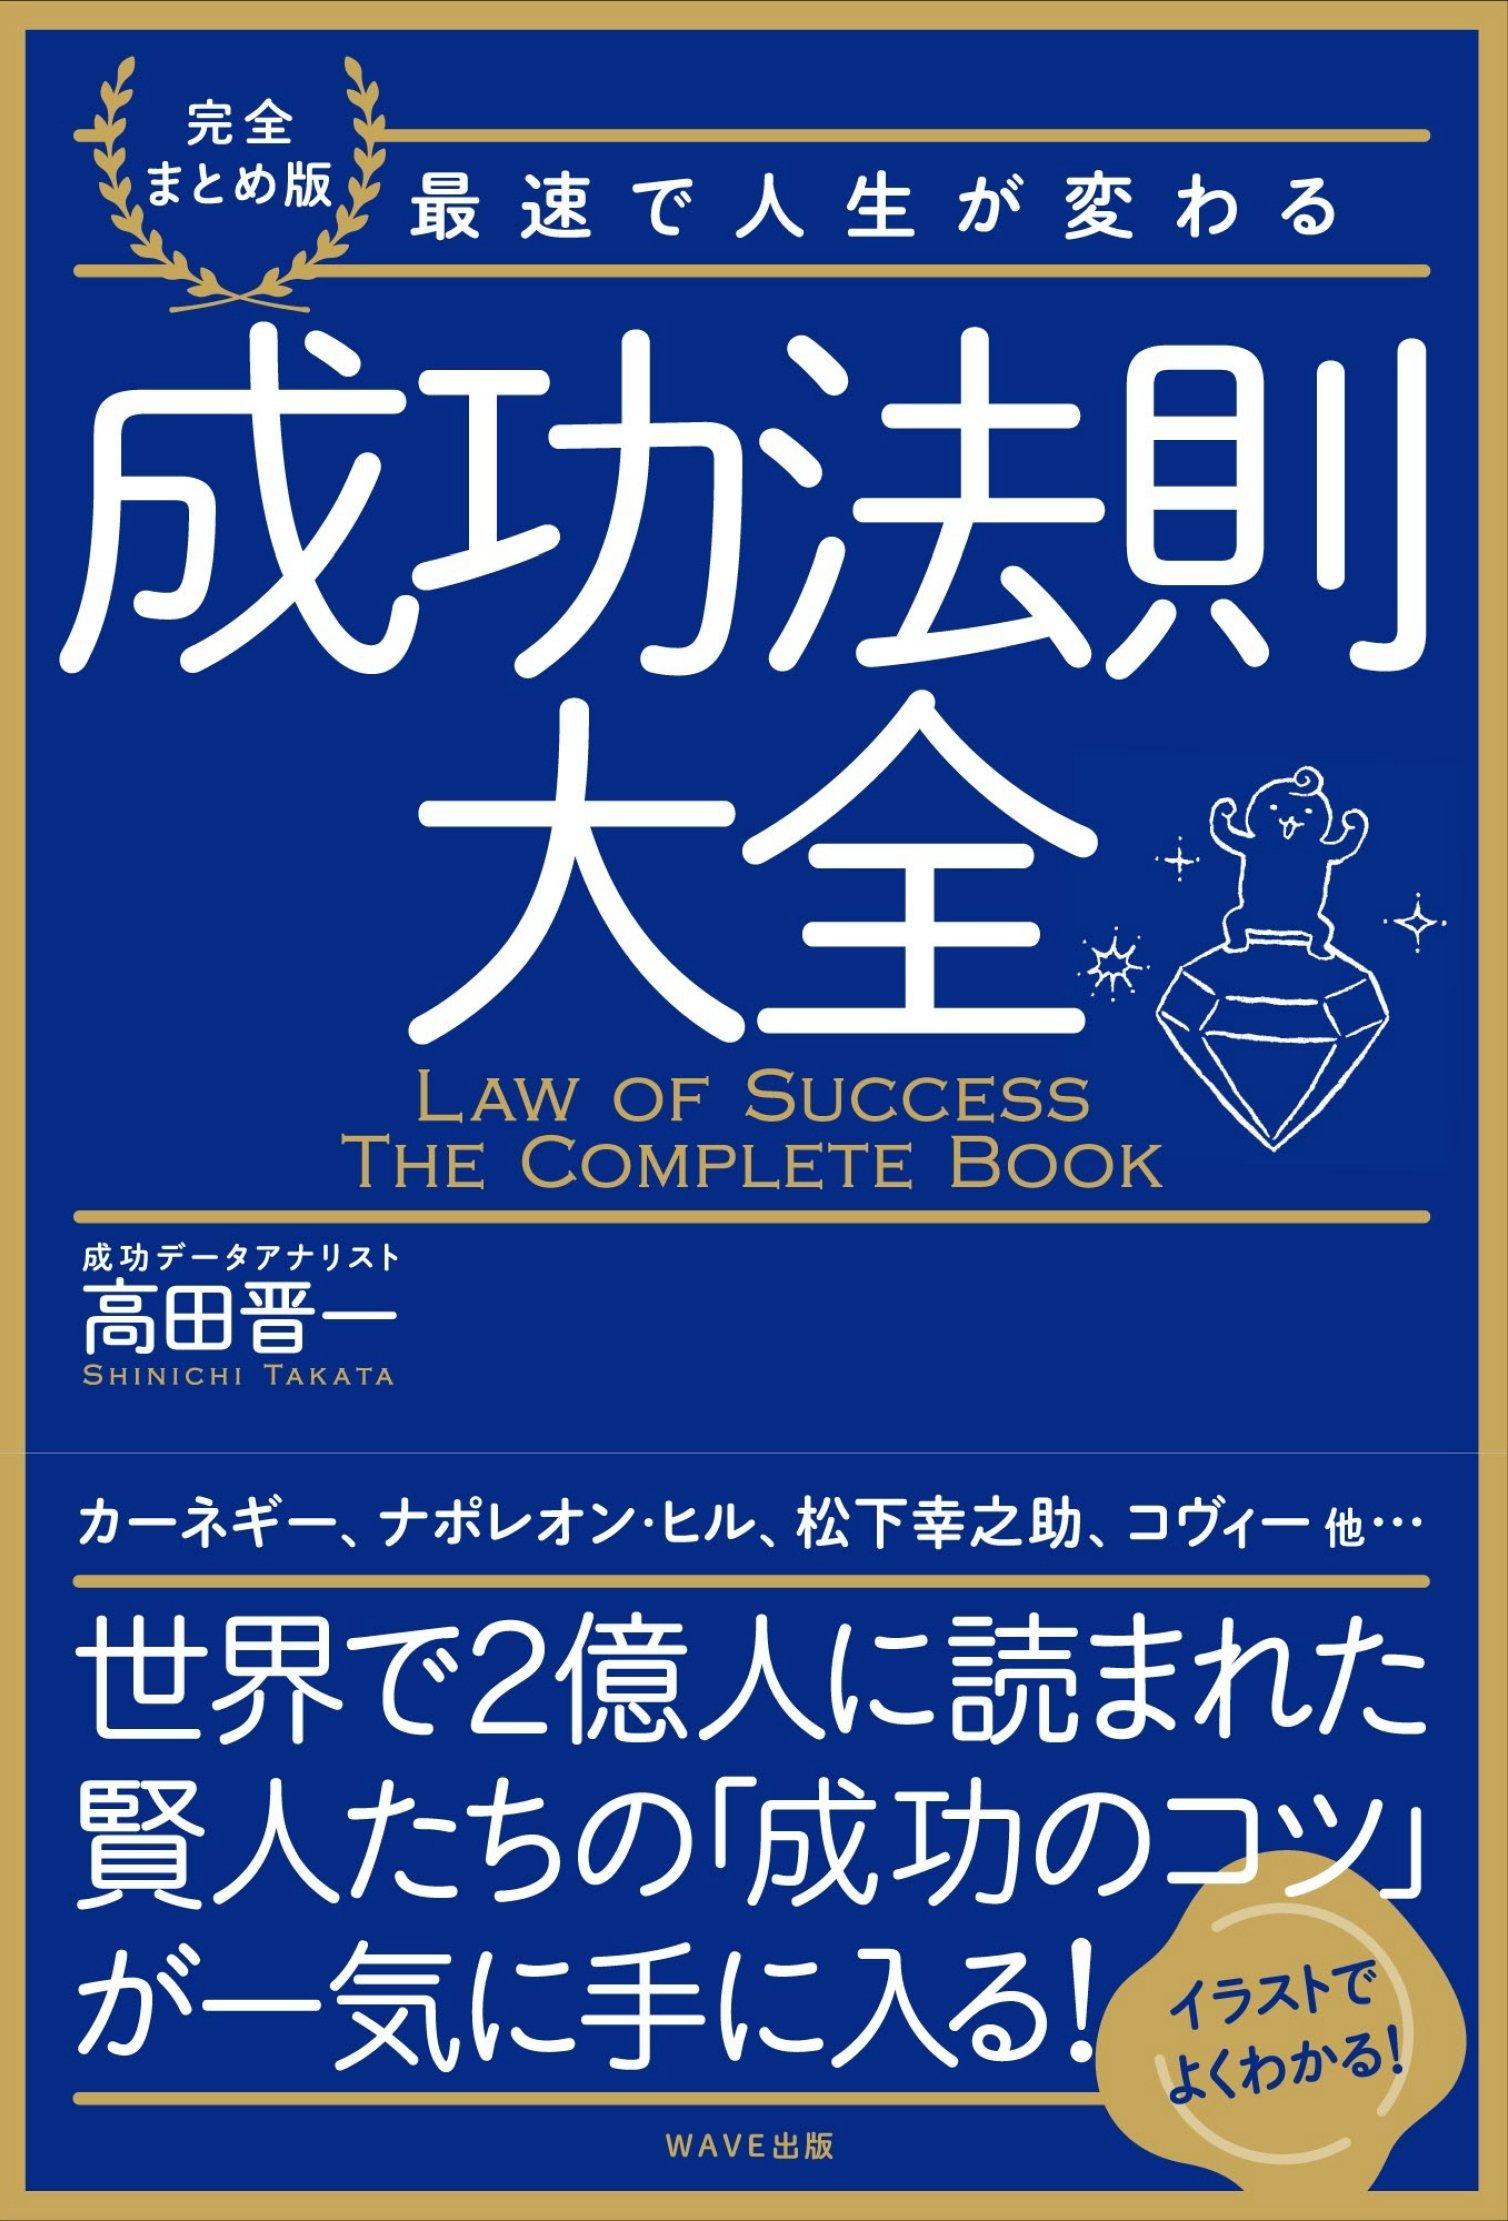 【NEWS】本日、新刊発売します!